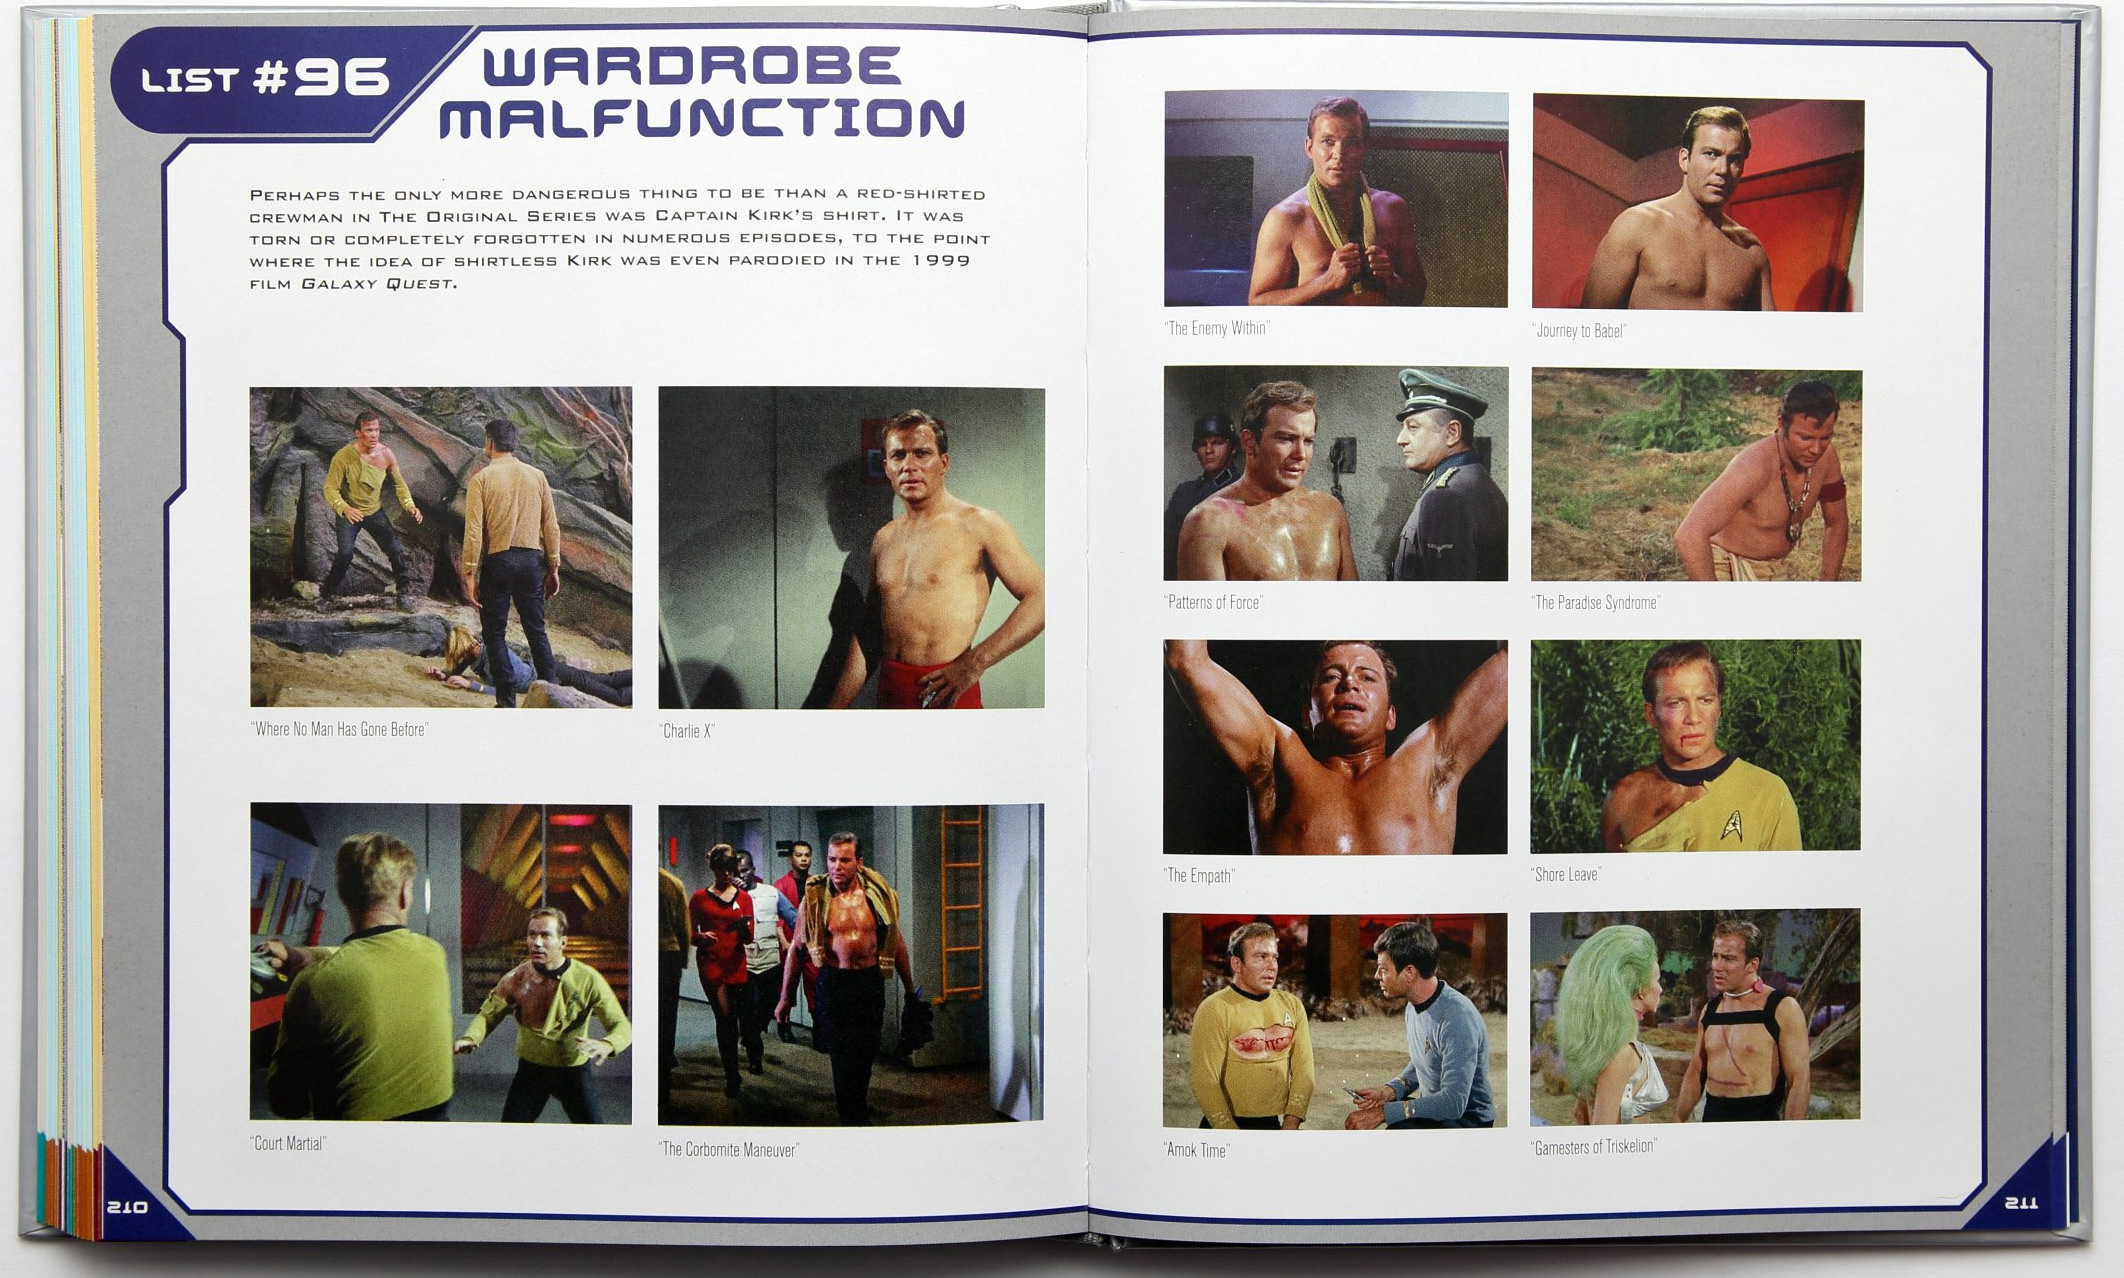 Star Trek Book Of Lists Wardrobe Malfunctions